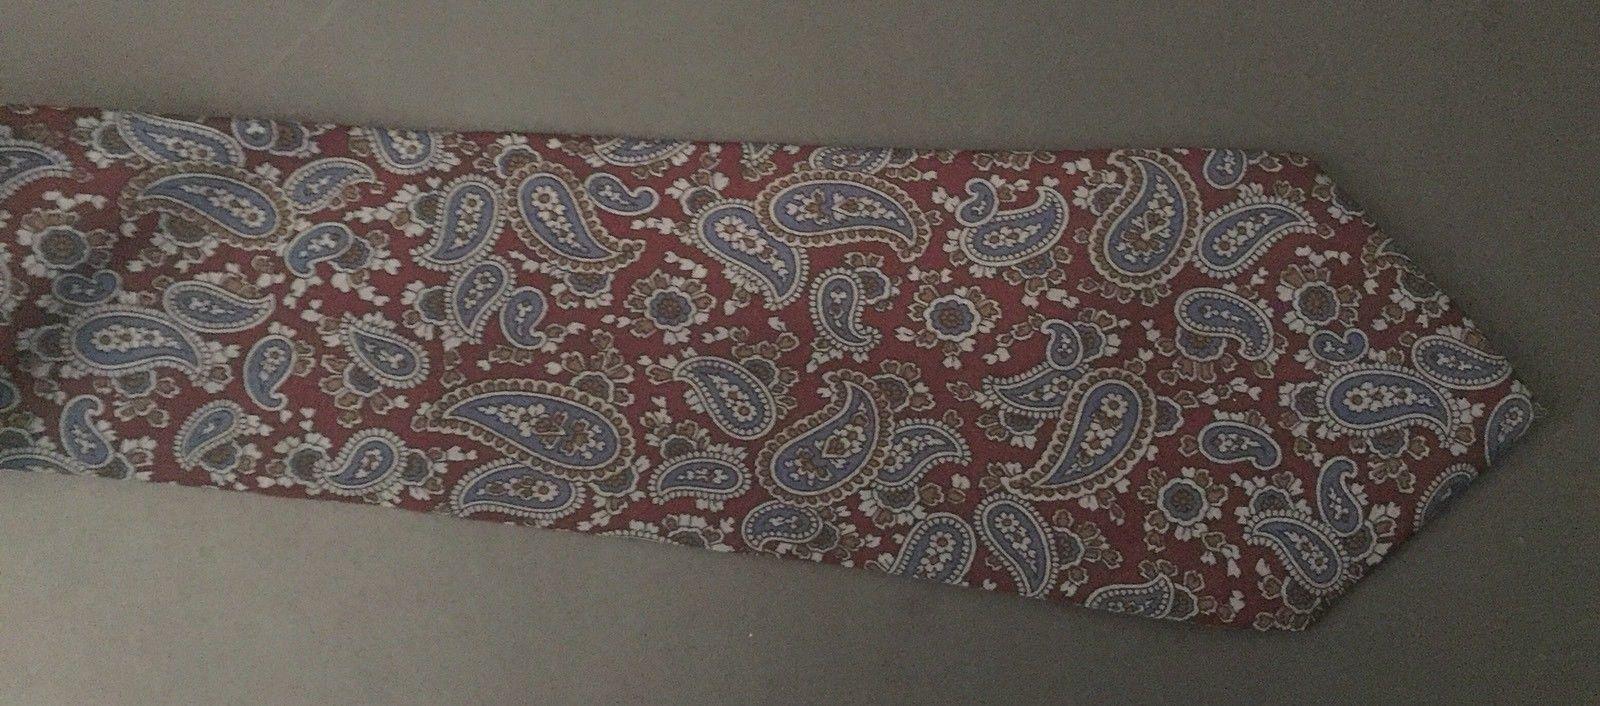 Geoffrey Beene Dark Paisley Tie Necktie Burgundy Blue Cohoes Silk Italian Made image 2